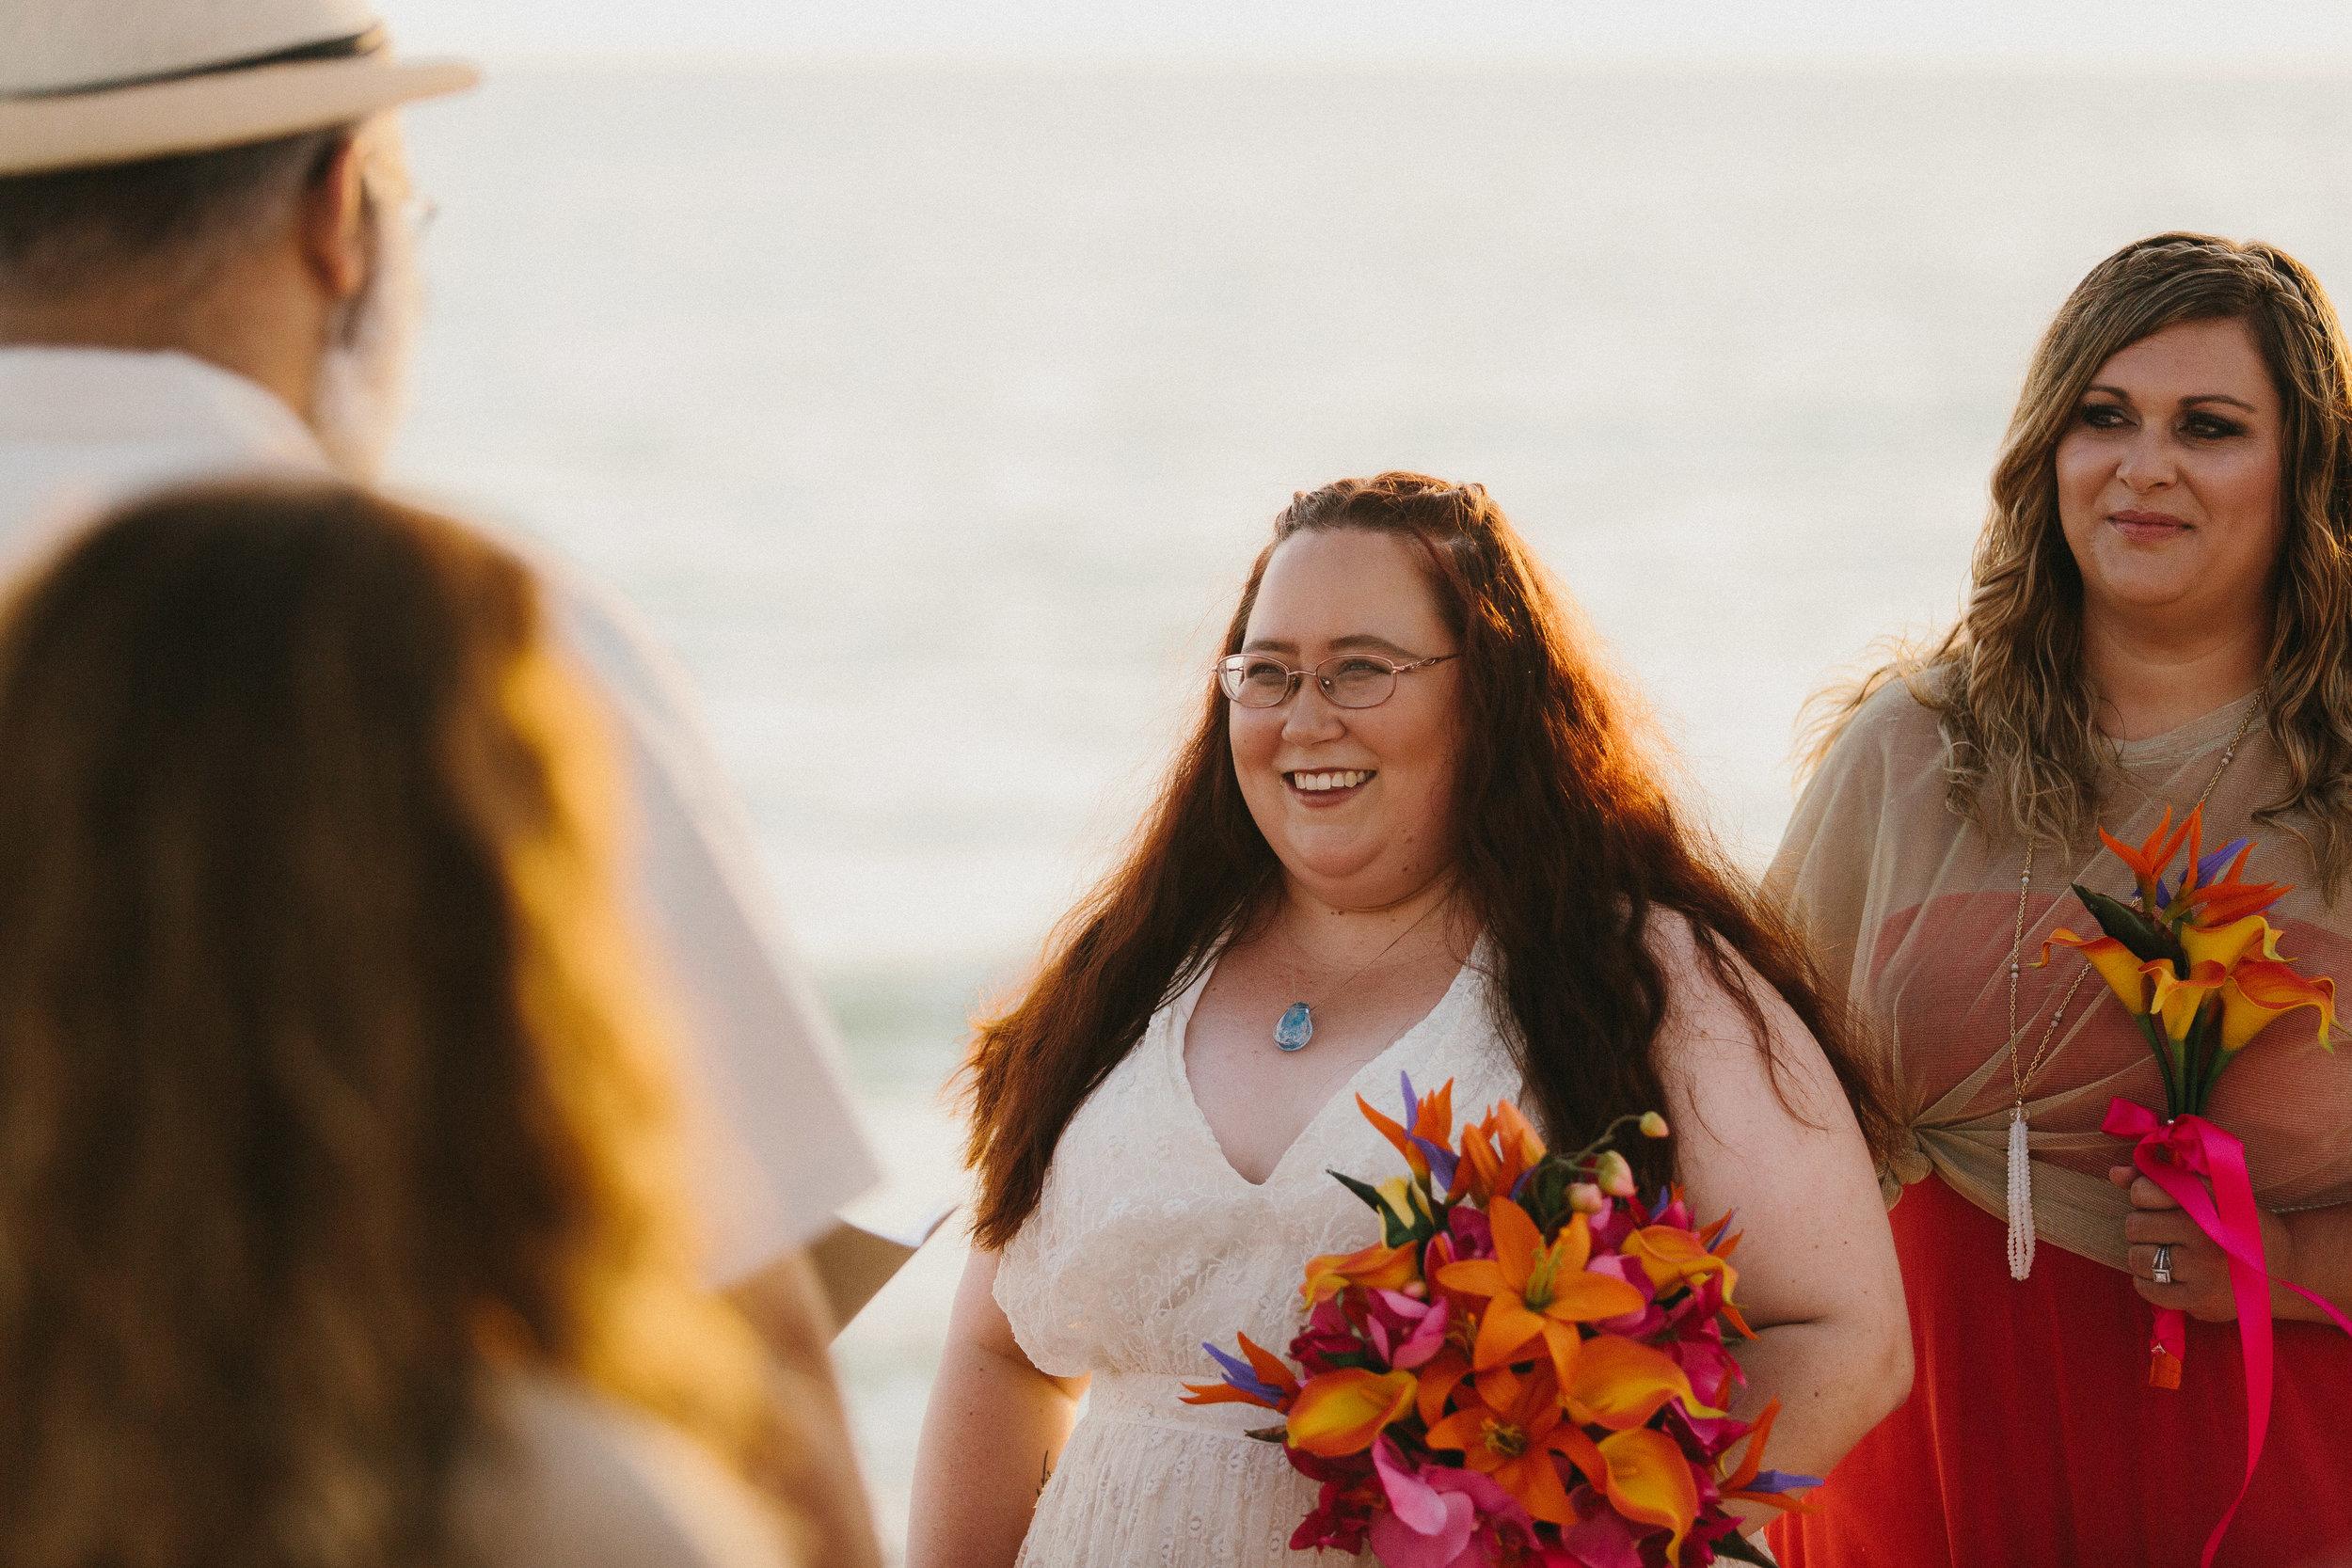 destin_sunset_beach_elopement_intimate_wedding_photographer_florida_documentary_1161.jpg